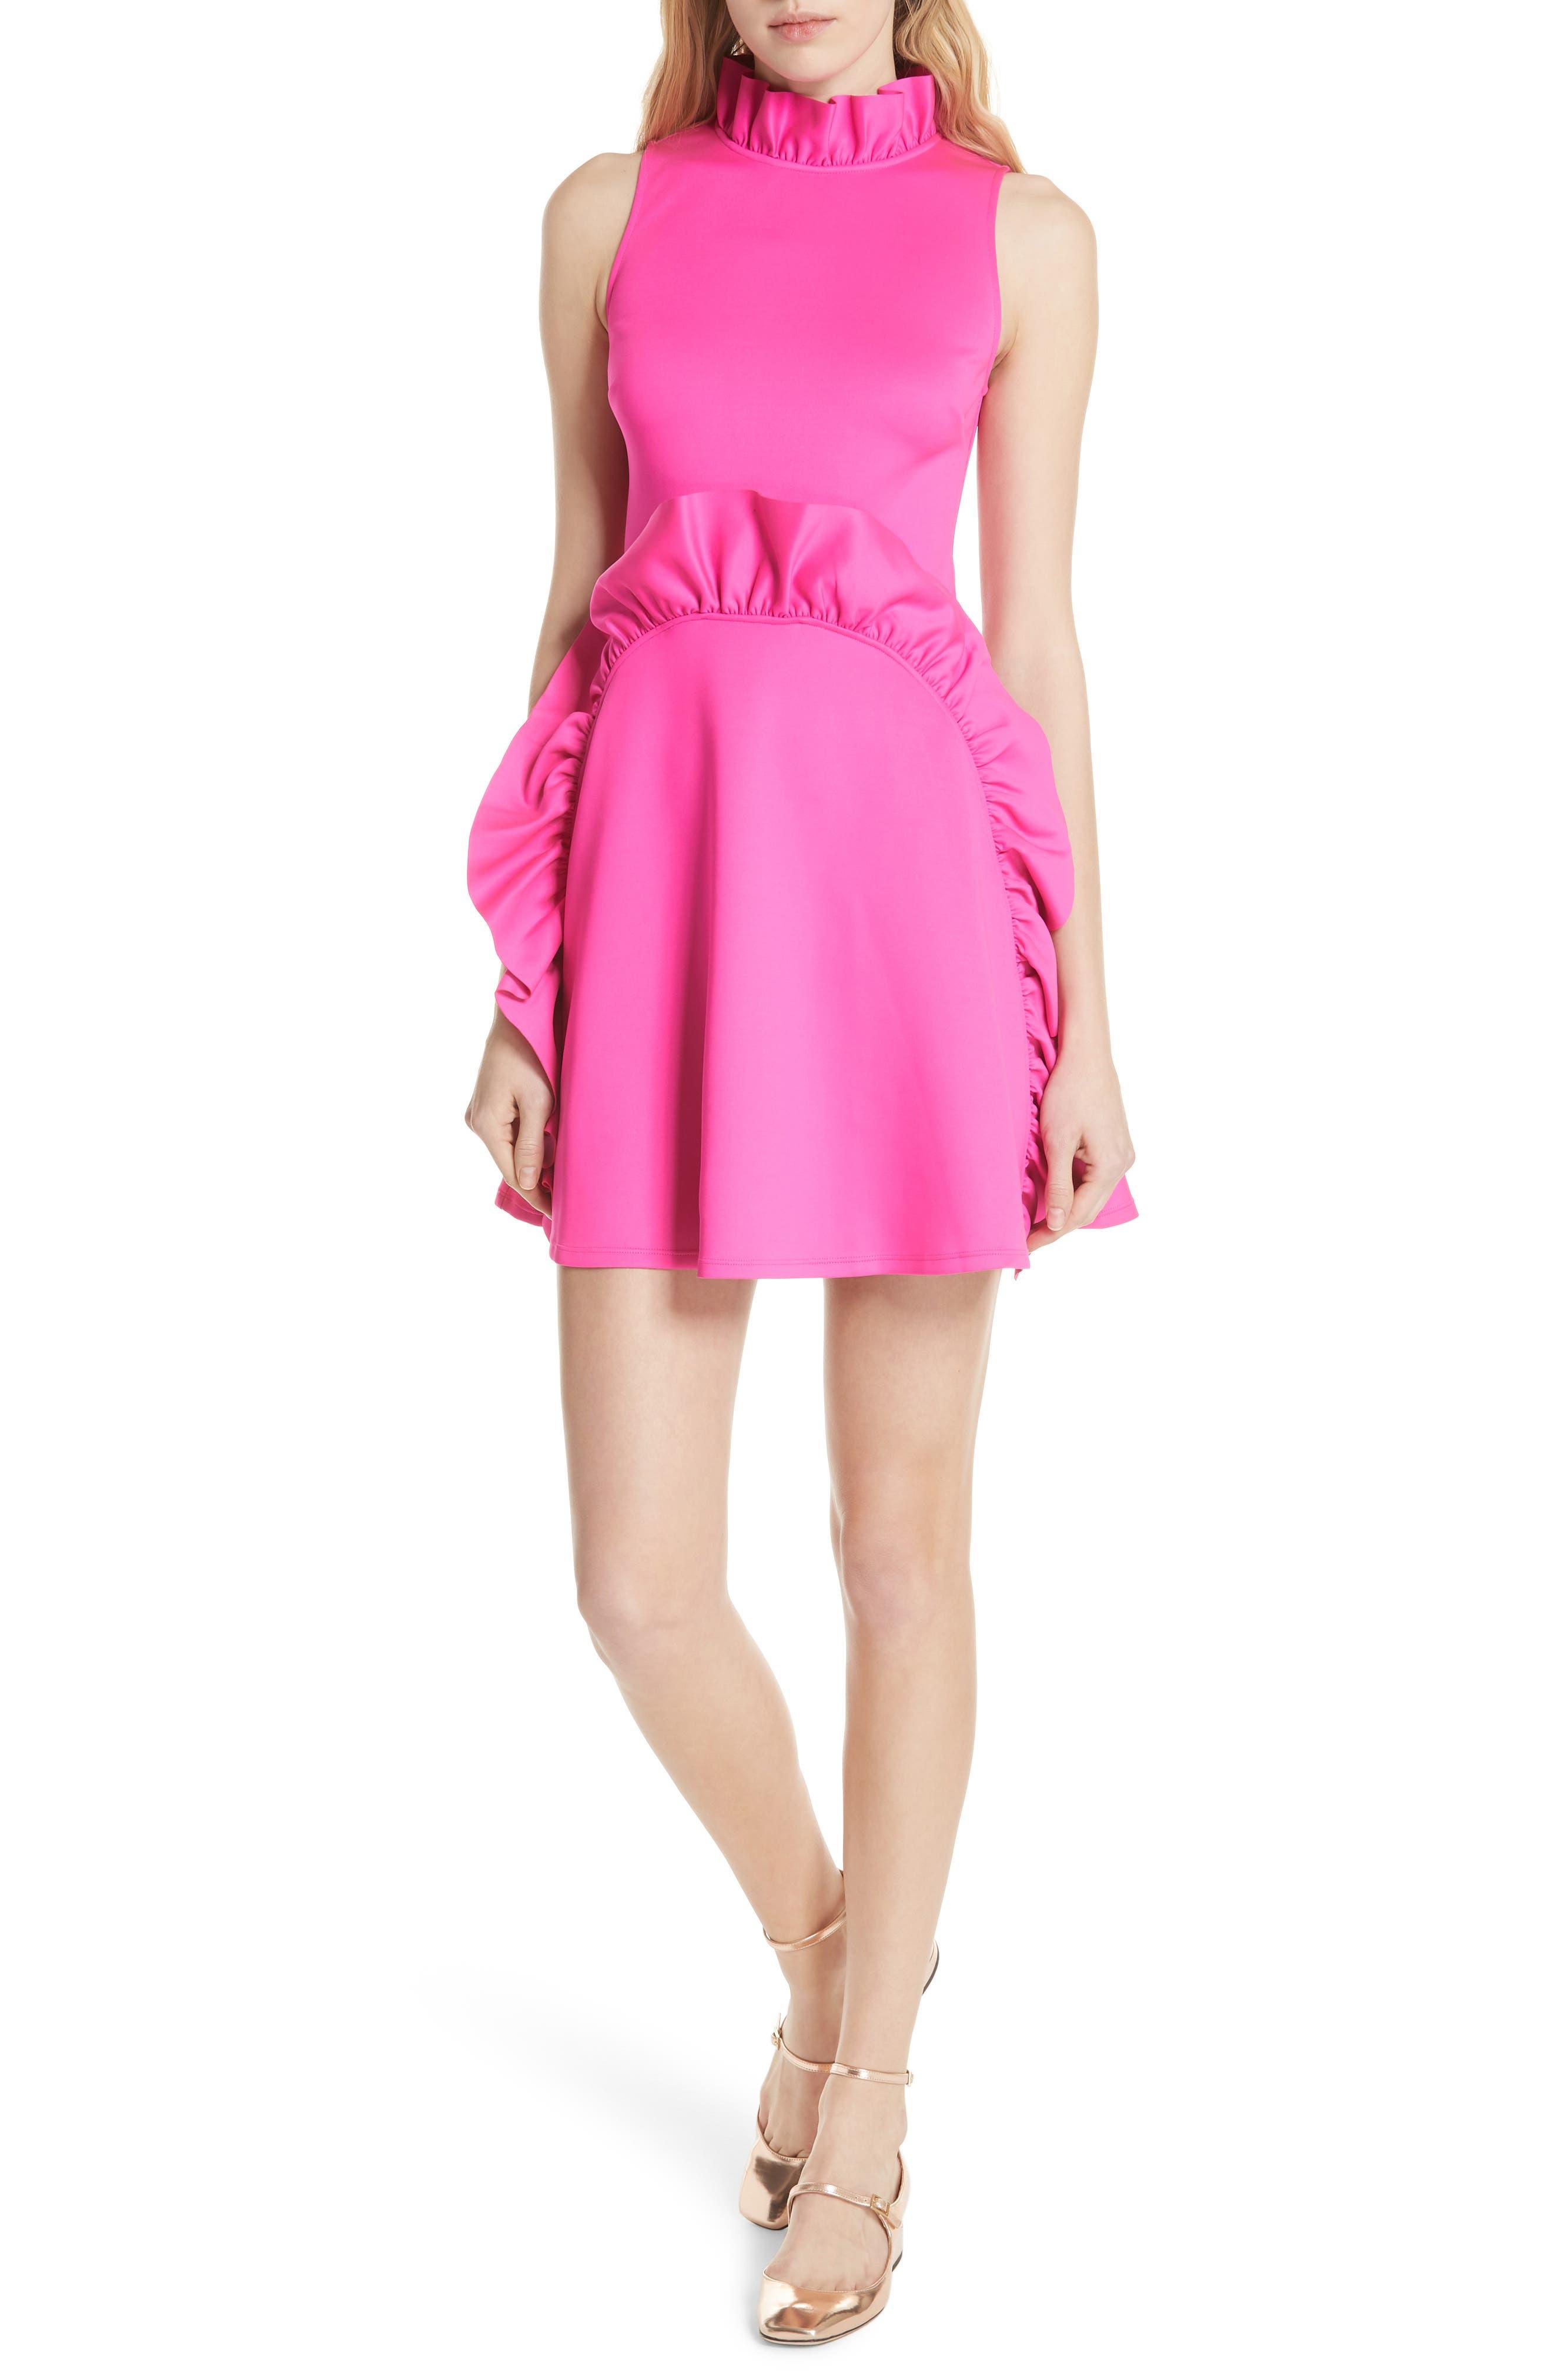 Jannett Laser Cut Ruffle Dress,                             Main thumbnail 1, color,                             671